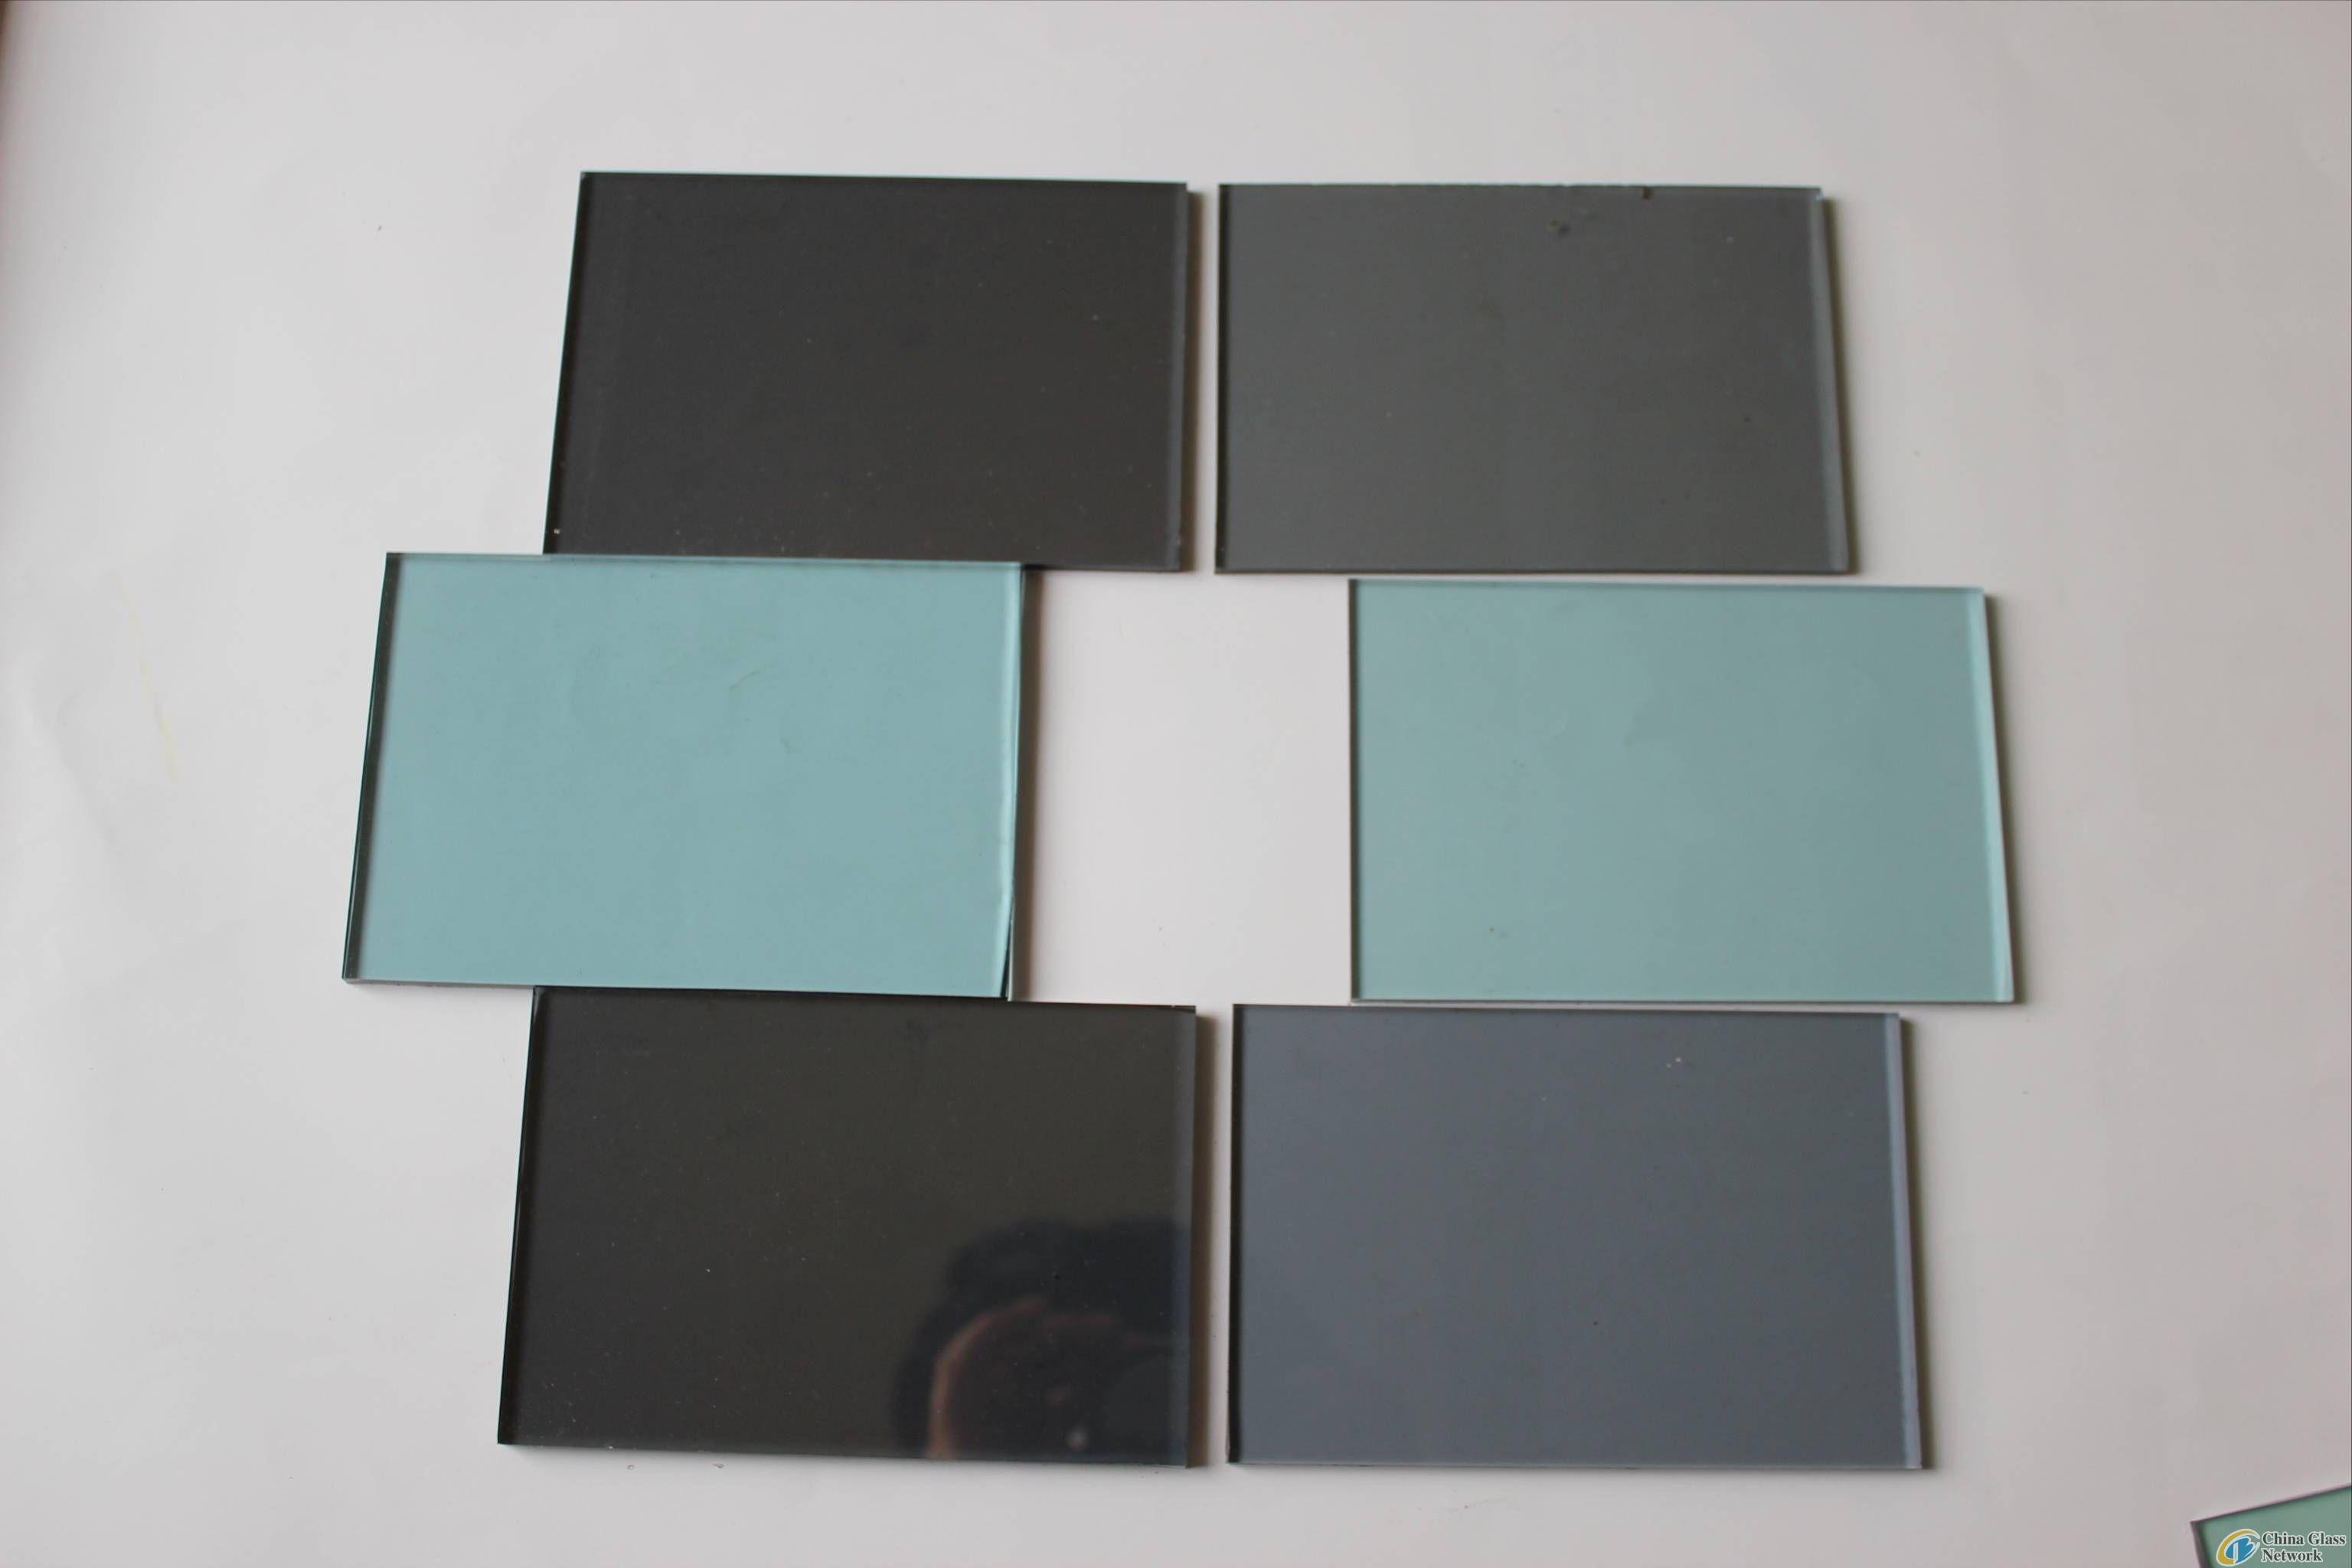 Lanxing grey reflective glass